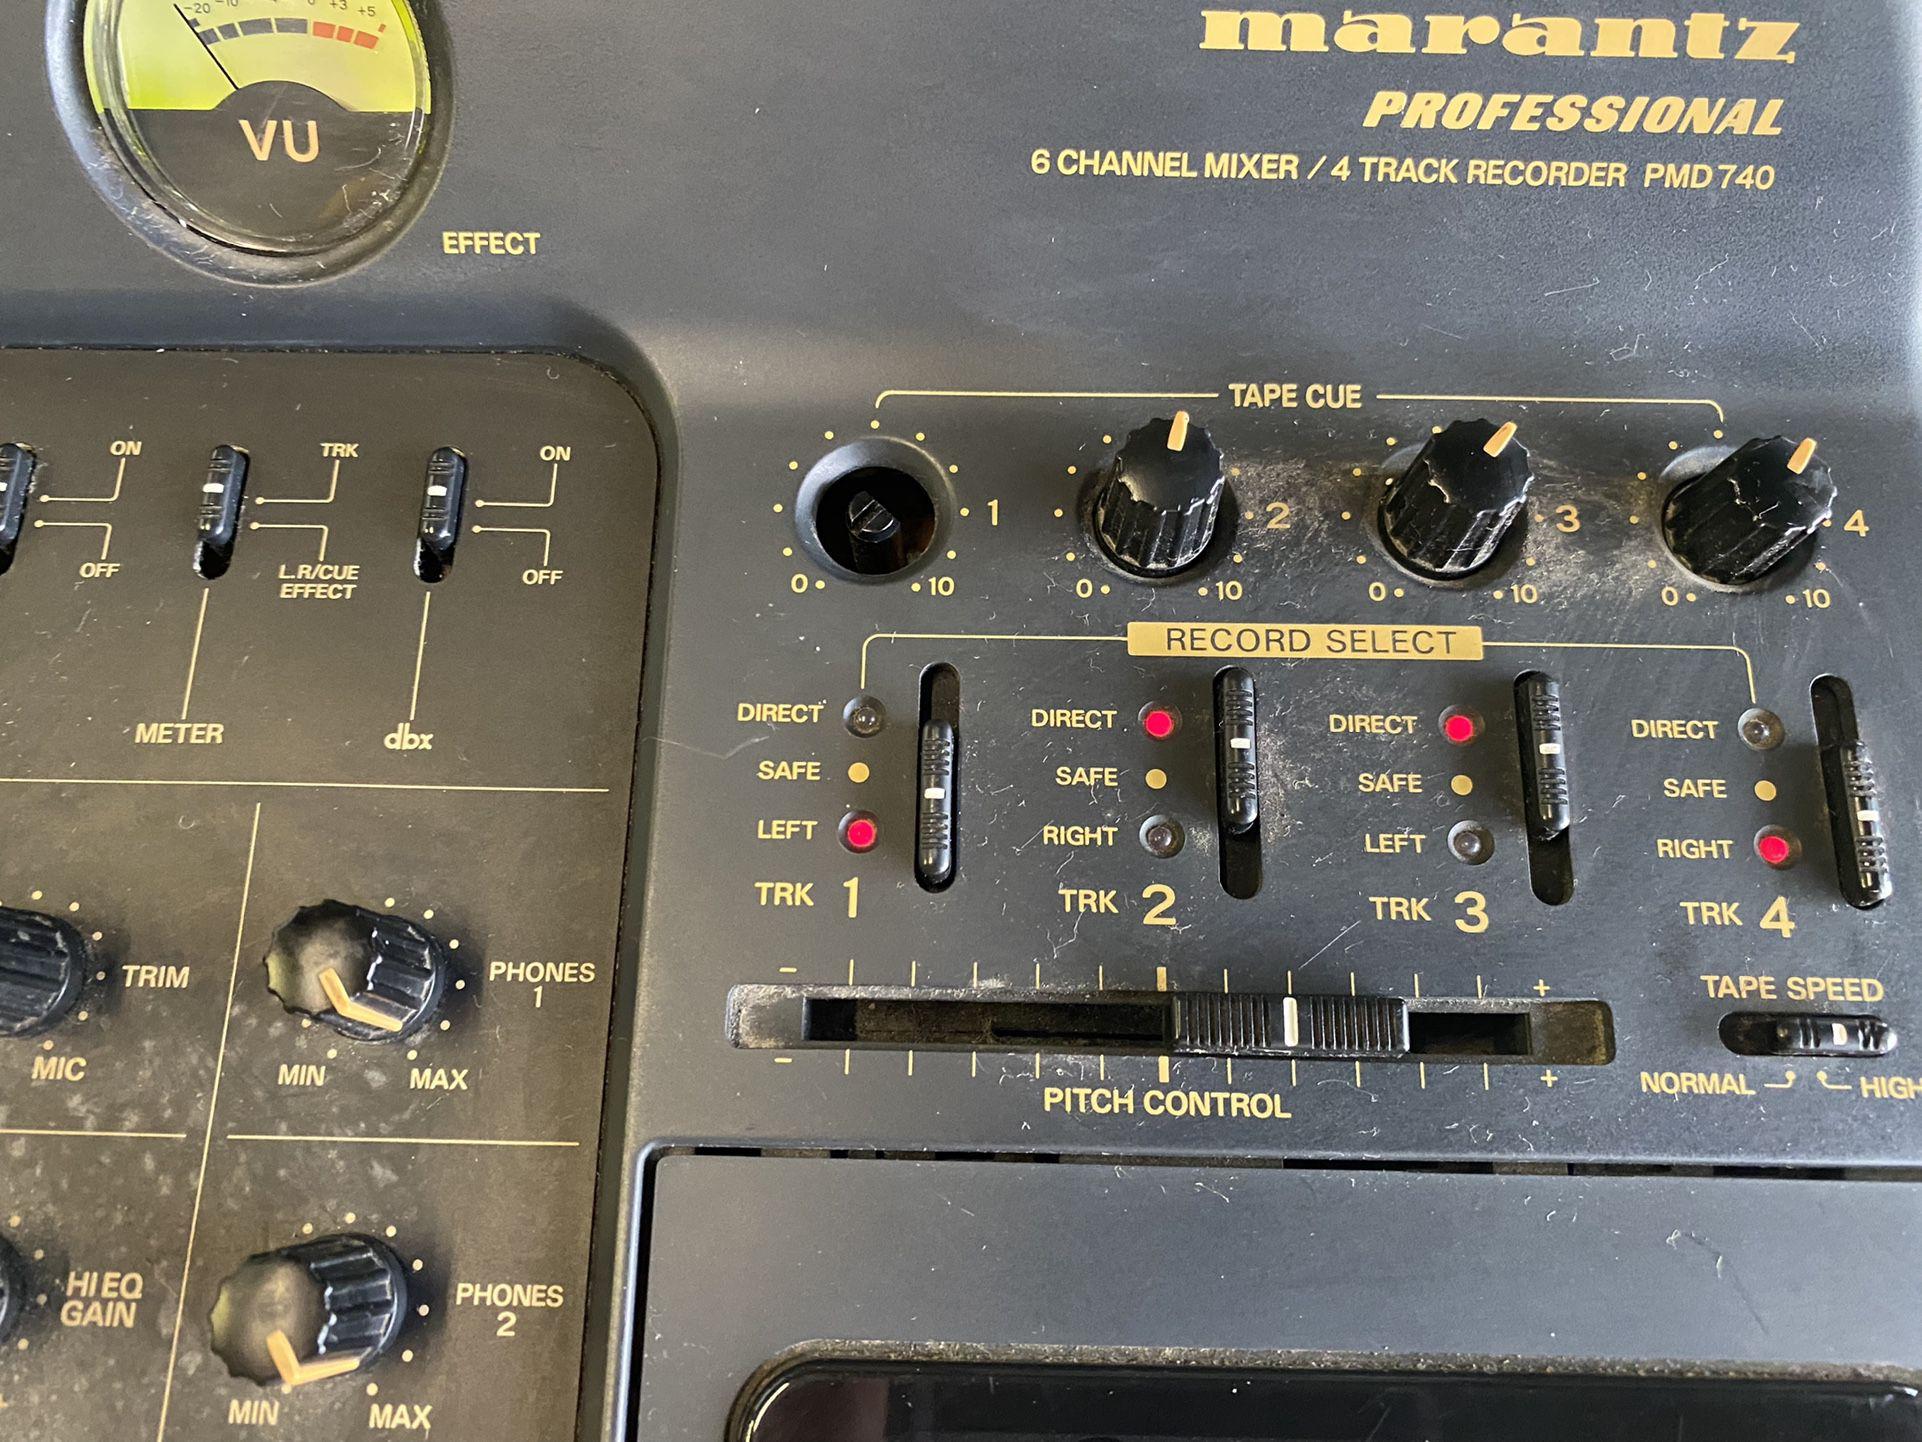 USED MARANTZ  PROFESSIONAL 6 CHANNEL MIXER/4TRCK RECORDER PMD 740